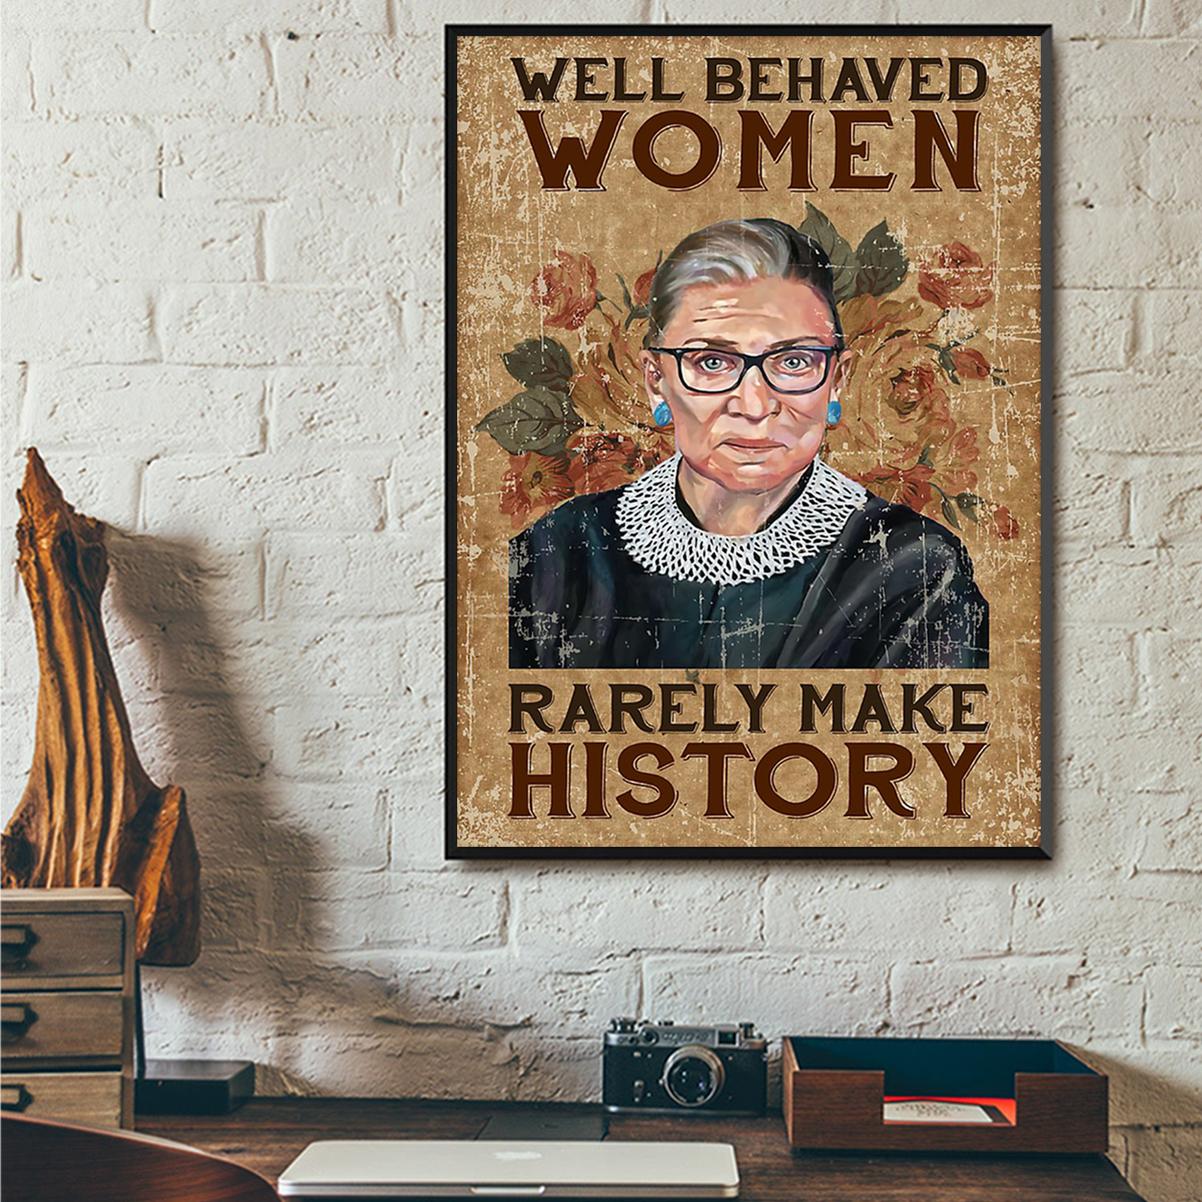 Ruth bader ginsburg well behaved woman rarely make history poster A1